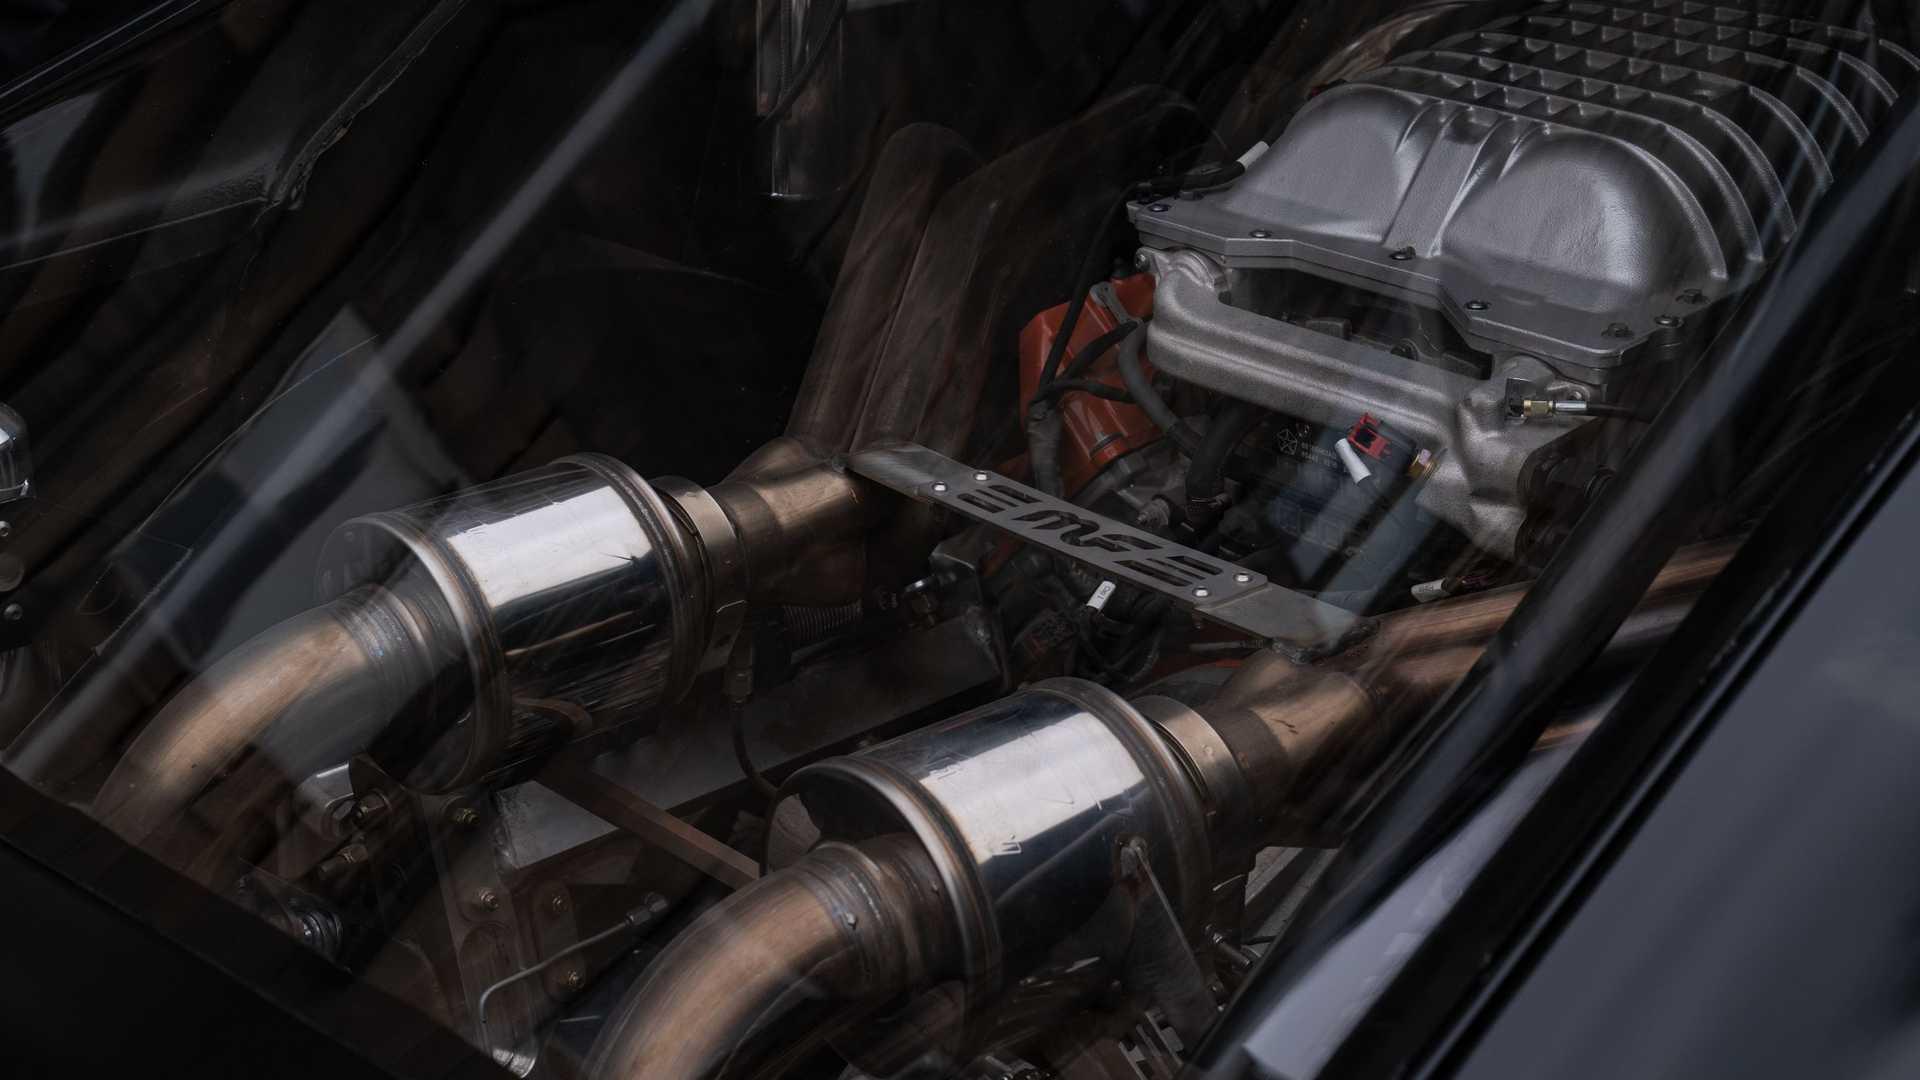 dom-s-mid-engine-1968-dodge-charger-engine